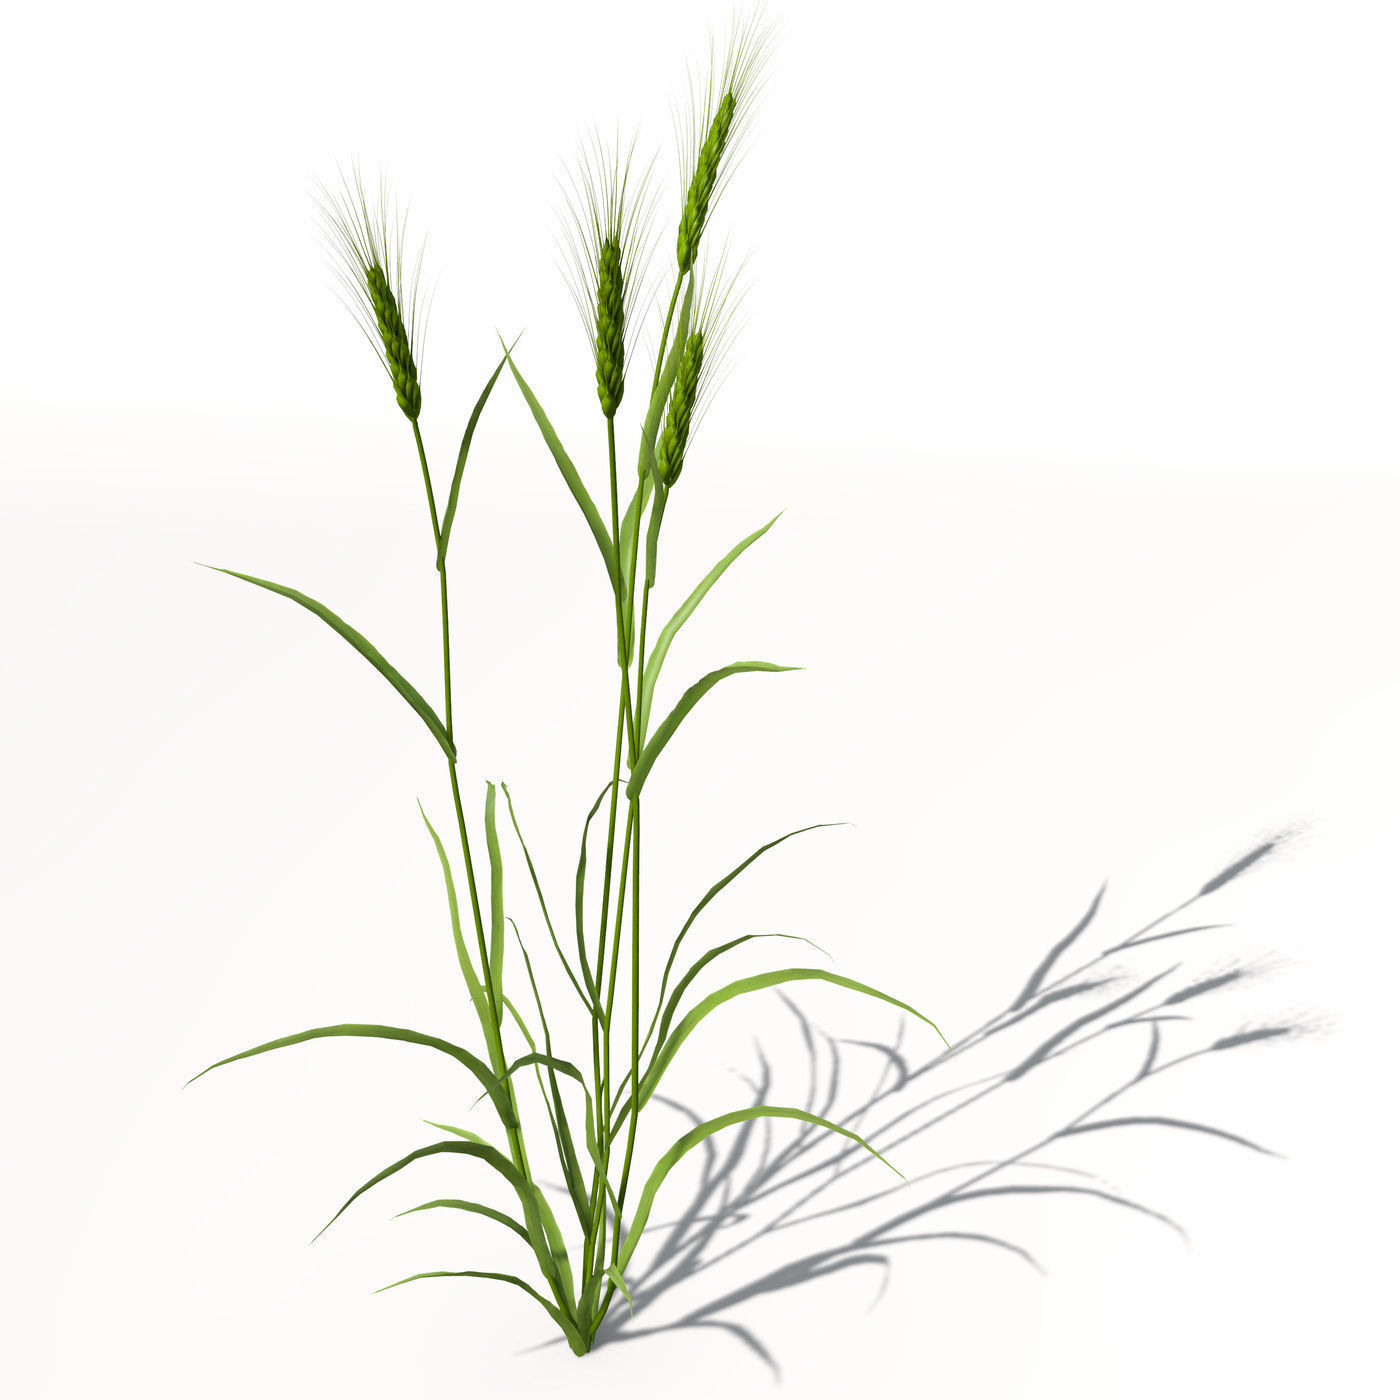 1400x1400 3d Model Xfrogplants Barley Cgtrader